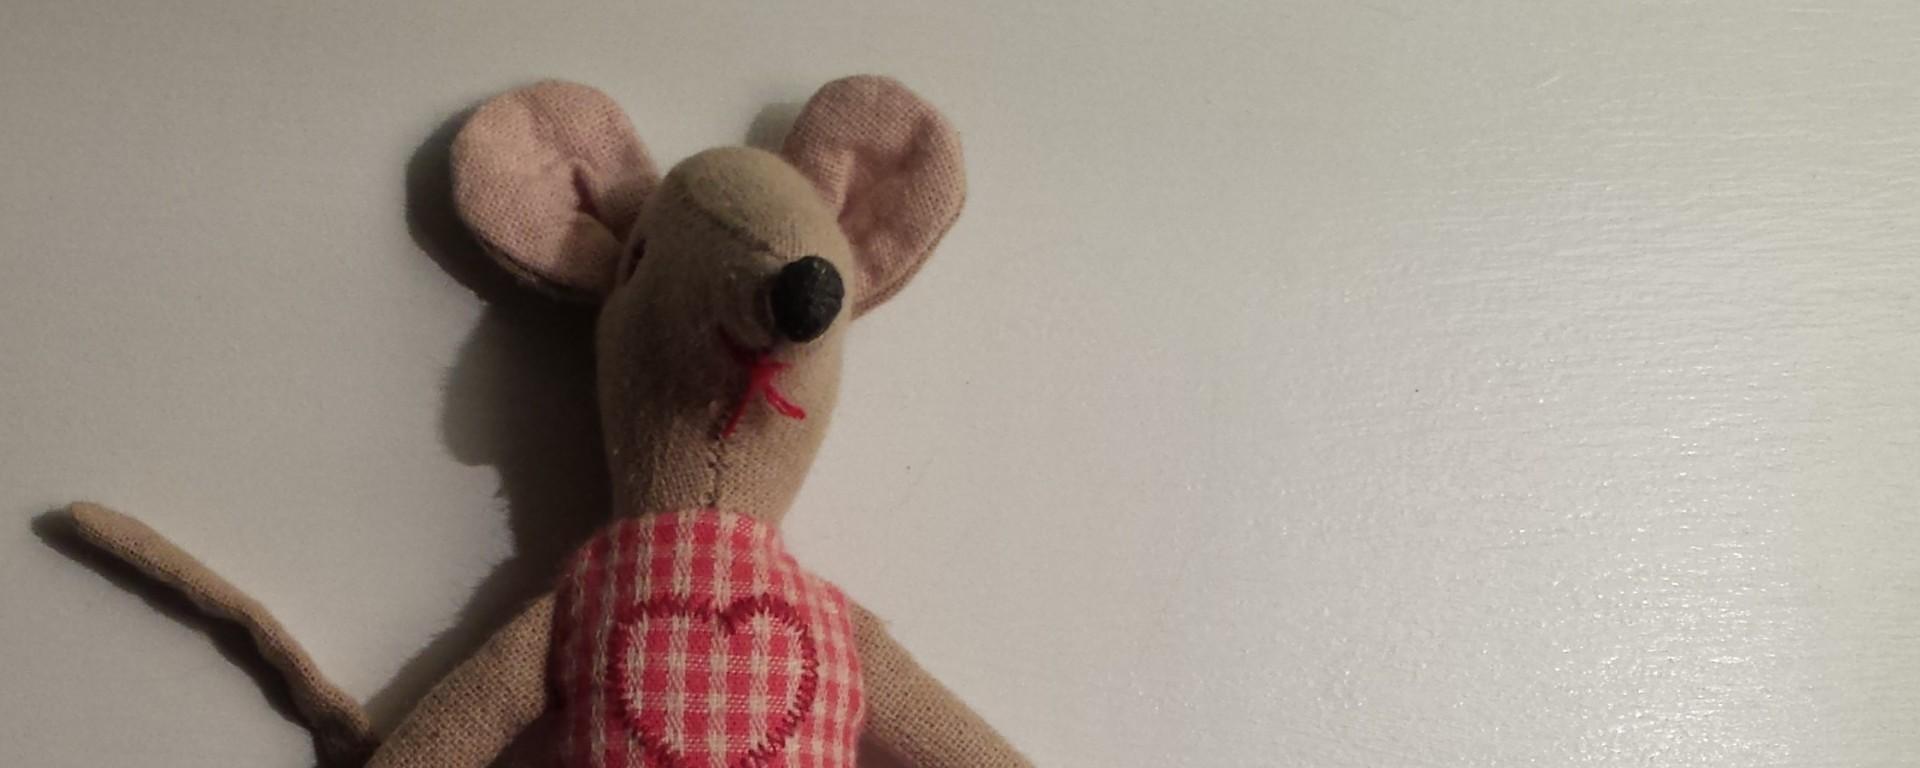 Stuffed animal mouse.